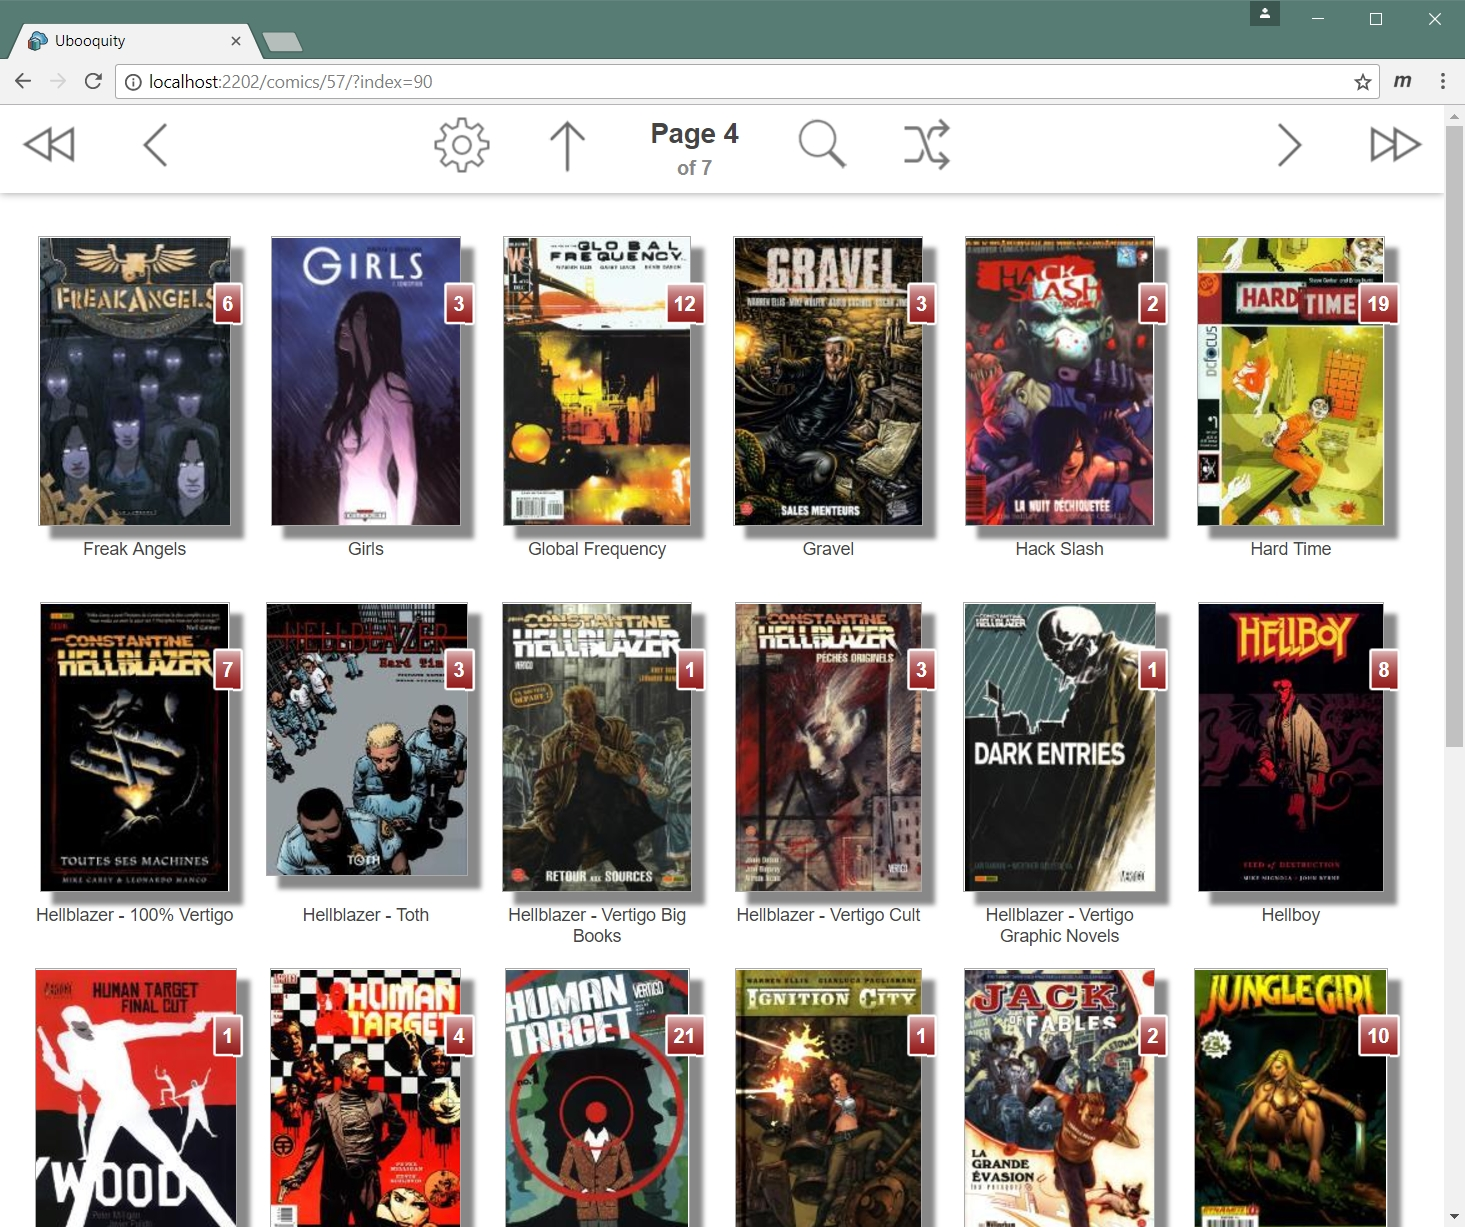 [Imagen: 01_library_-comics-.jpg]